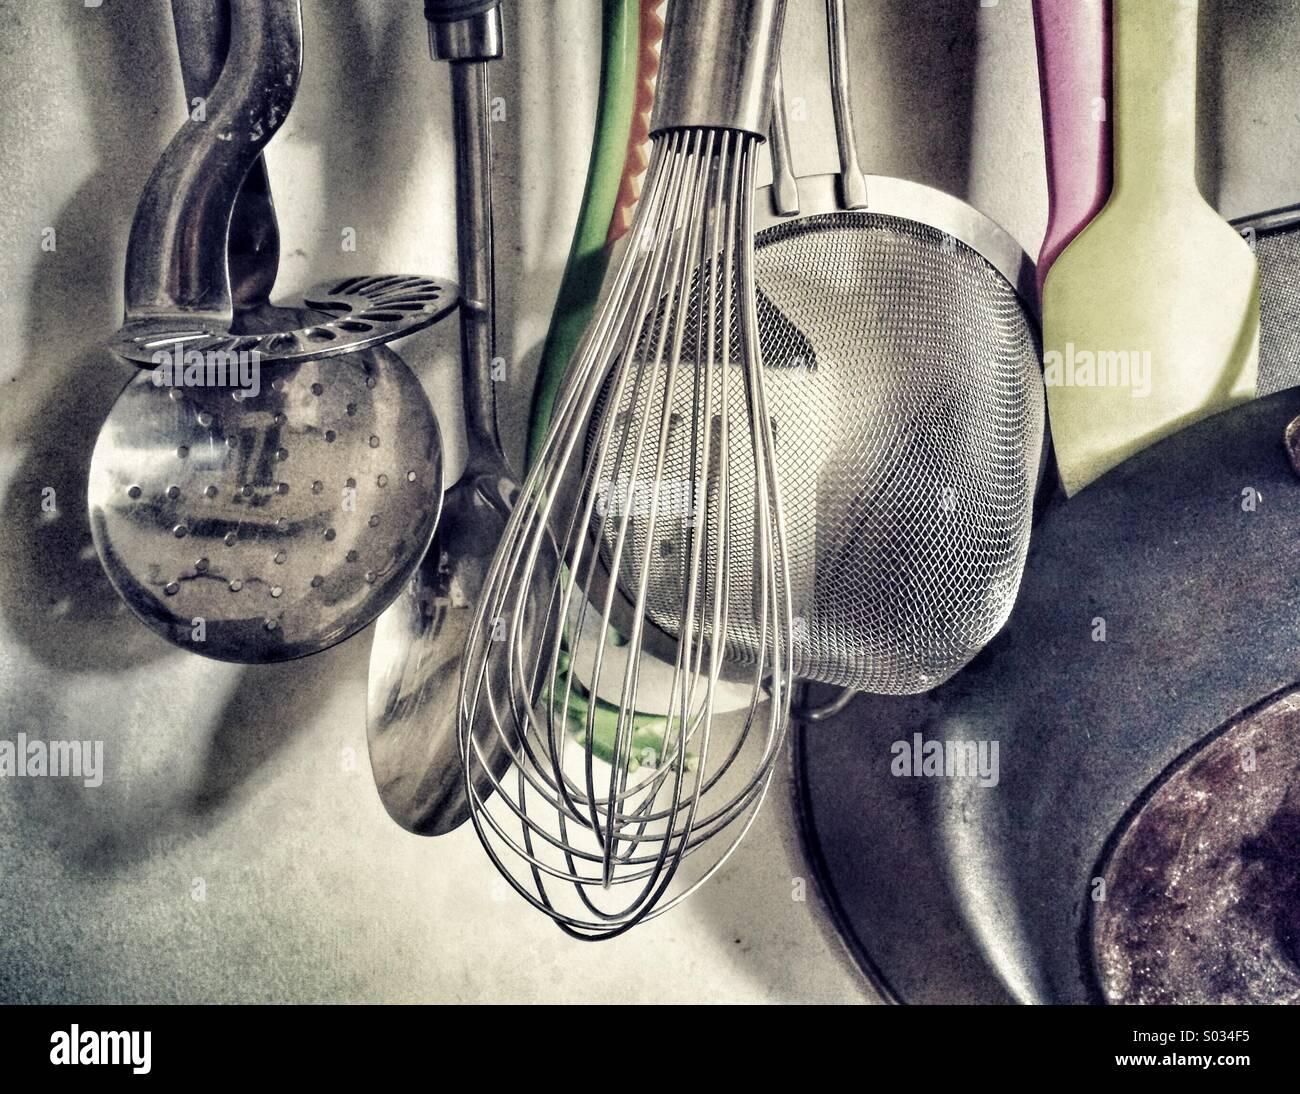 Kitchen Utensils. - Stock Image